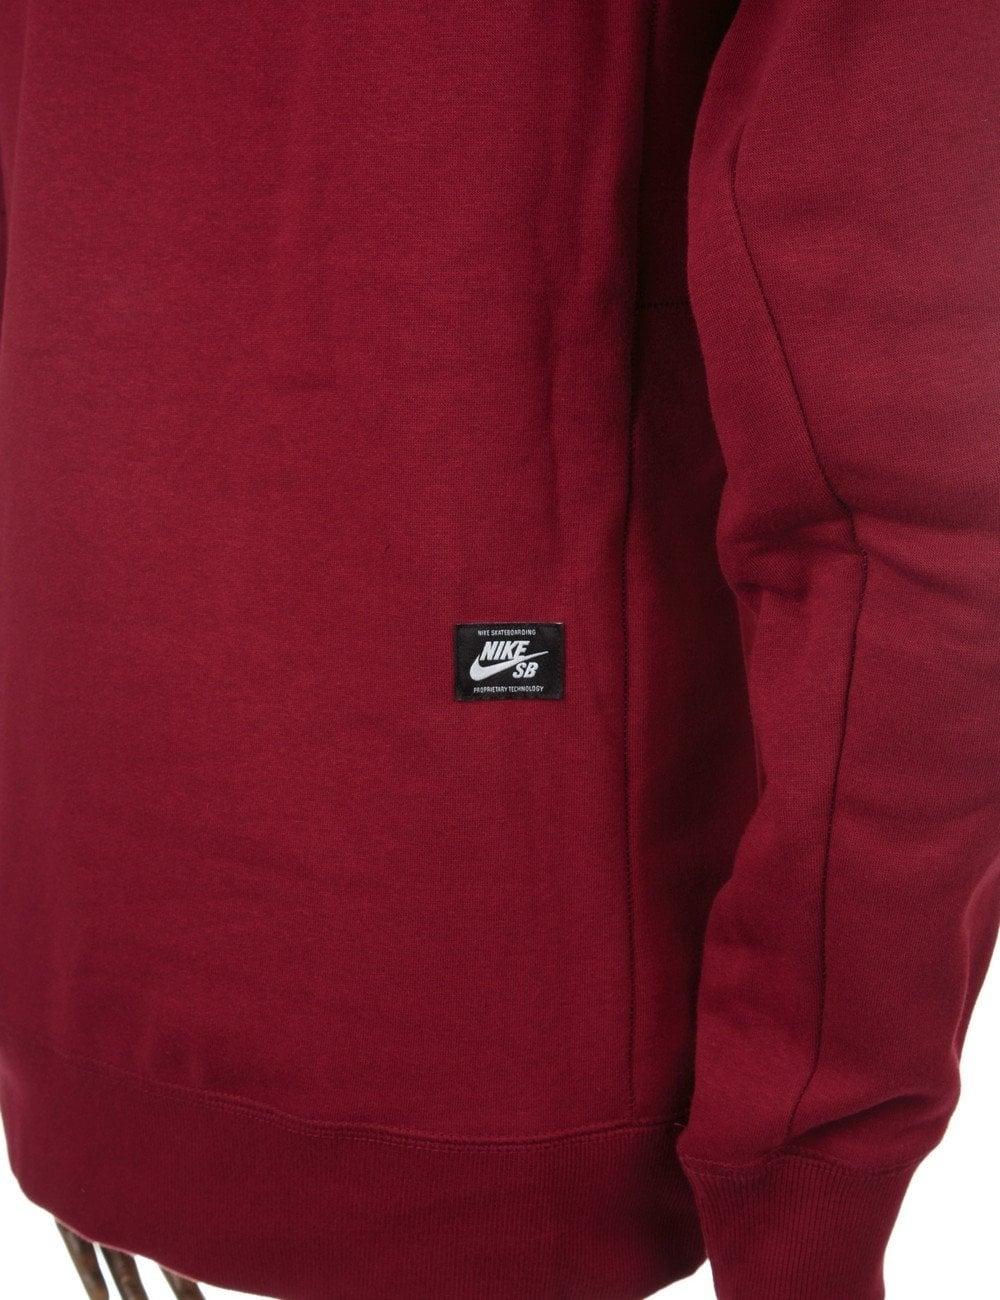 nike shox 9 large - Nike SB Icon Crewneck Sweatshirt - Team Red - Nike SB from Fat ...